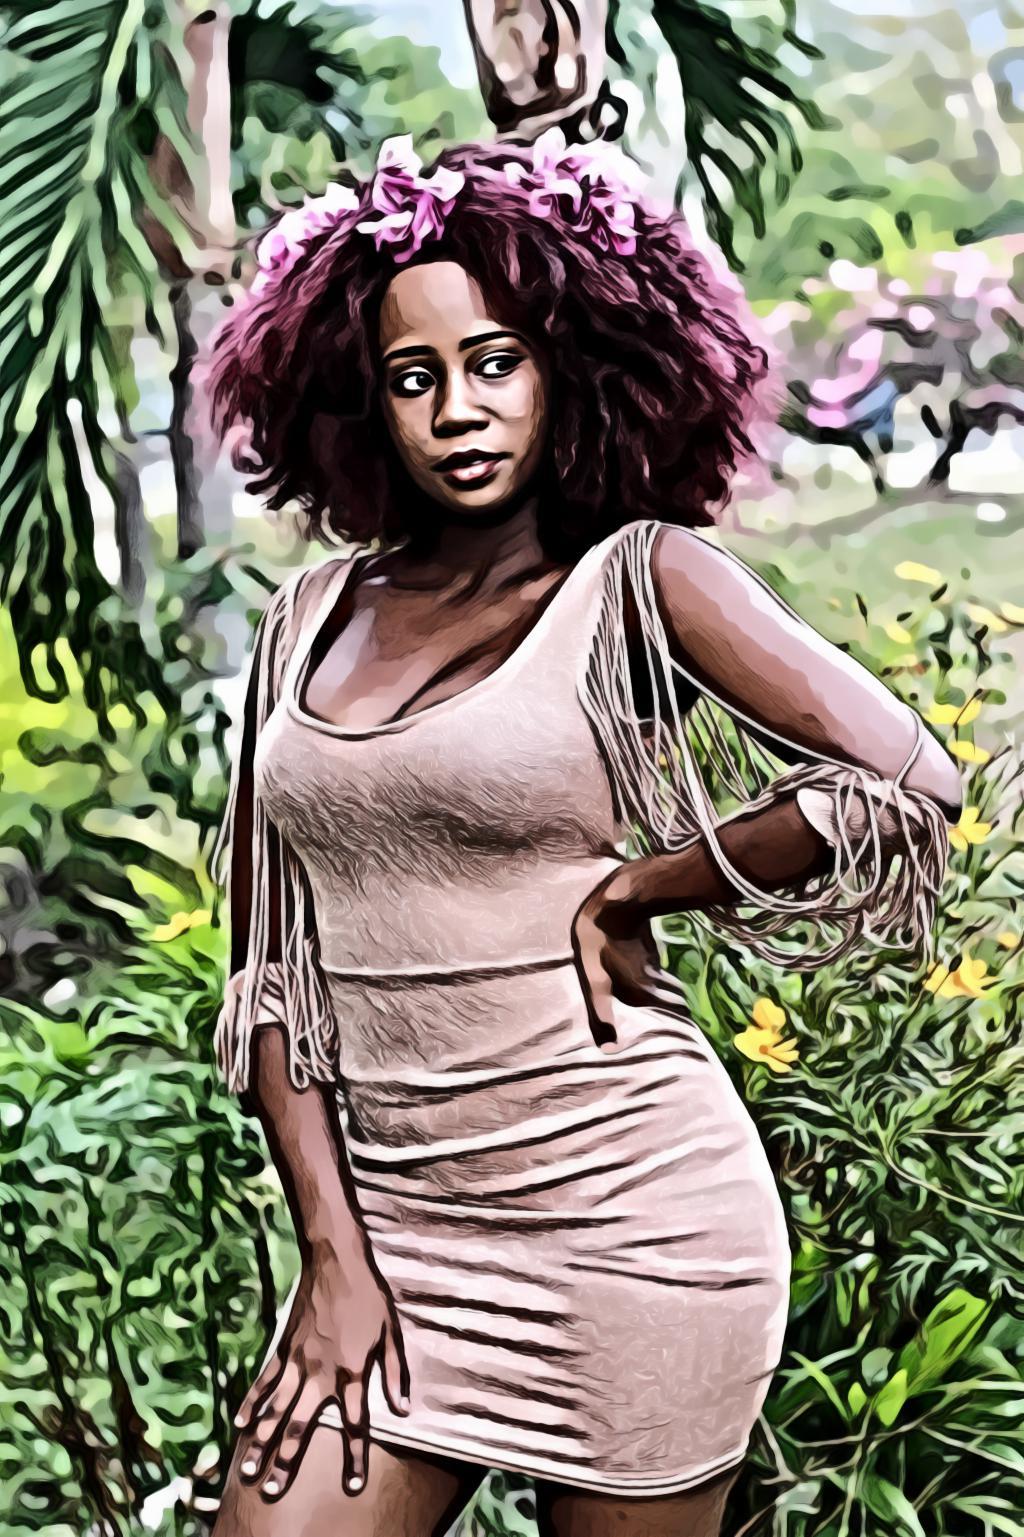 Woman with burgundy curly hair wearing beige sleeveless tasseled bodycon dress